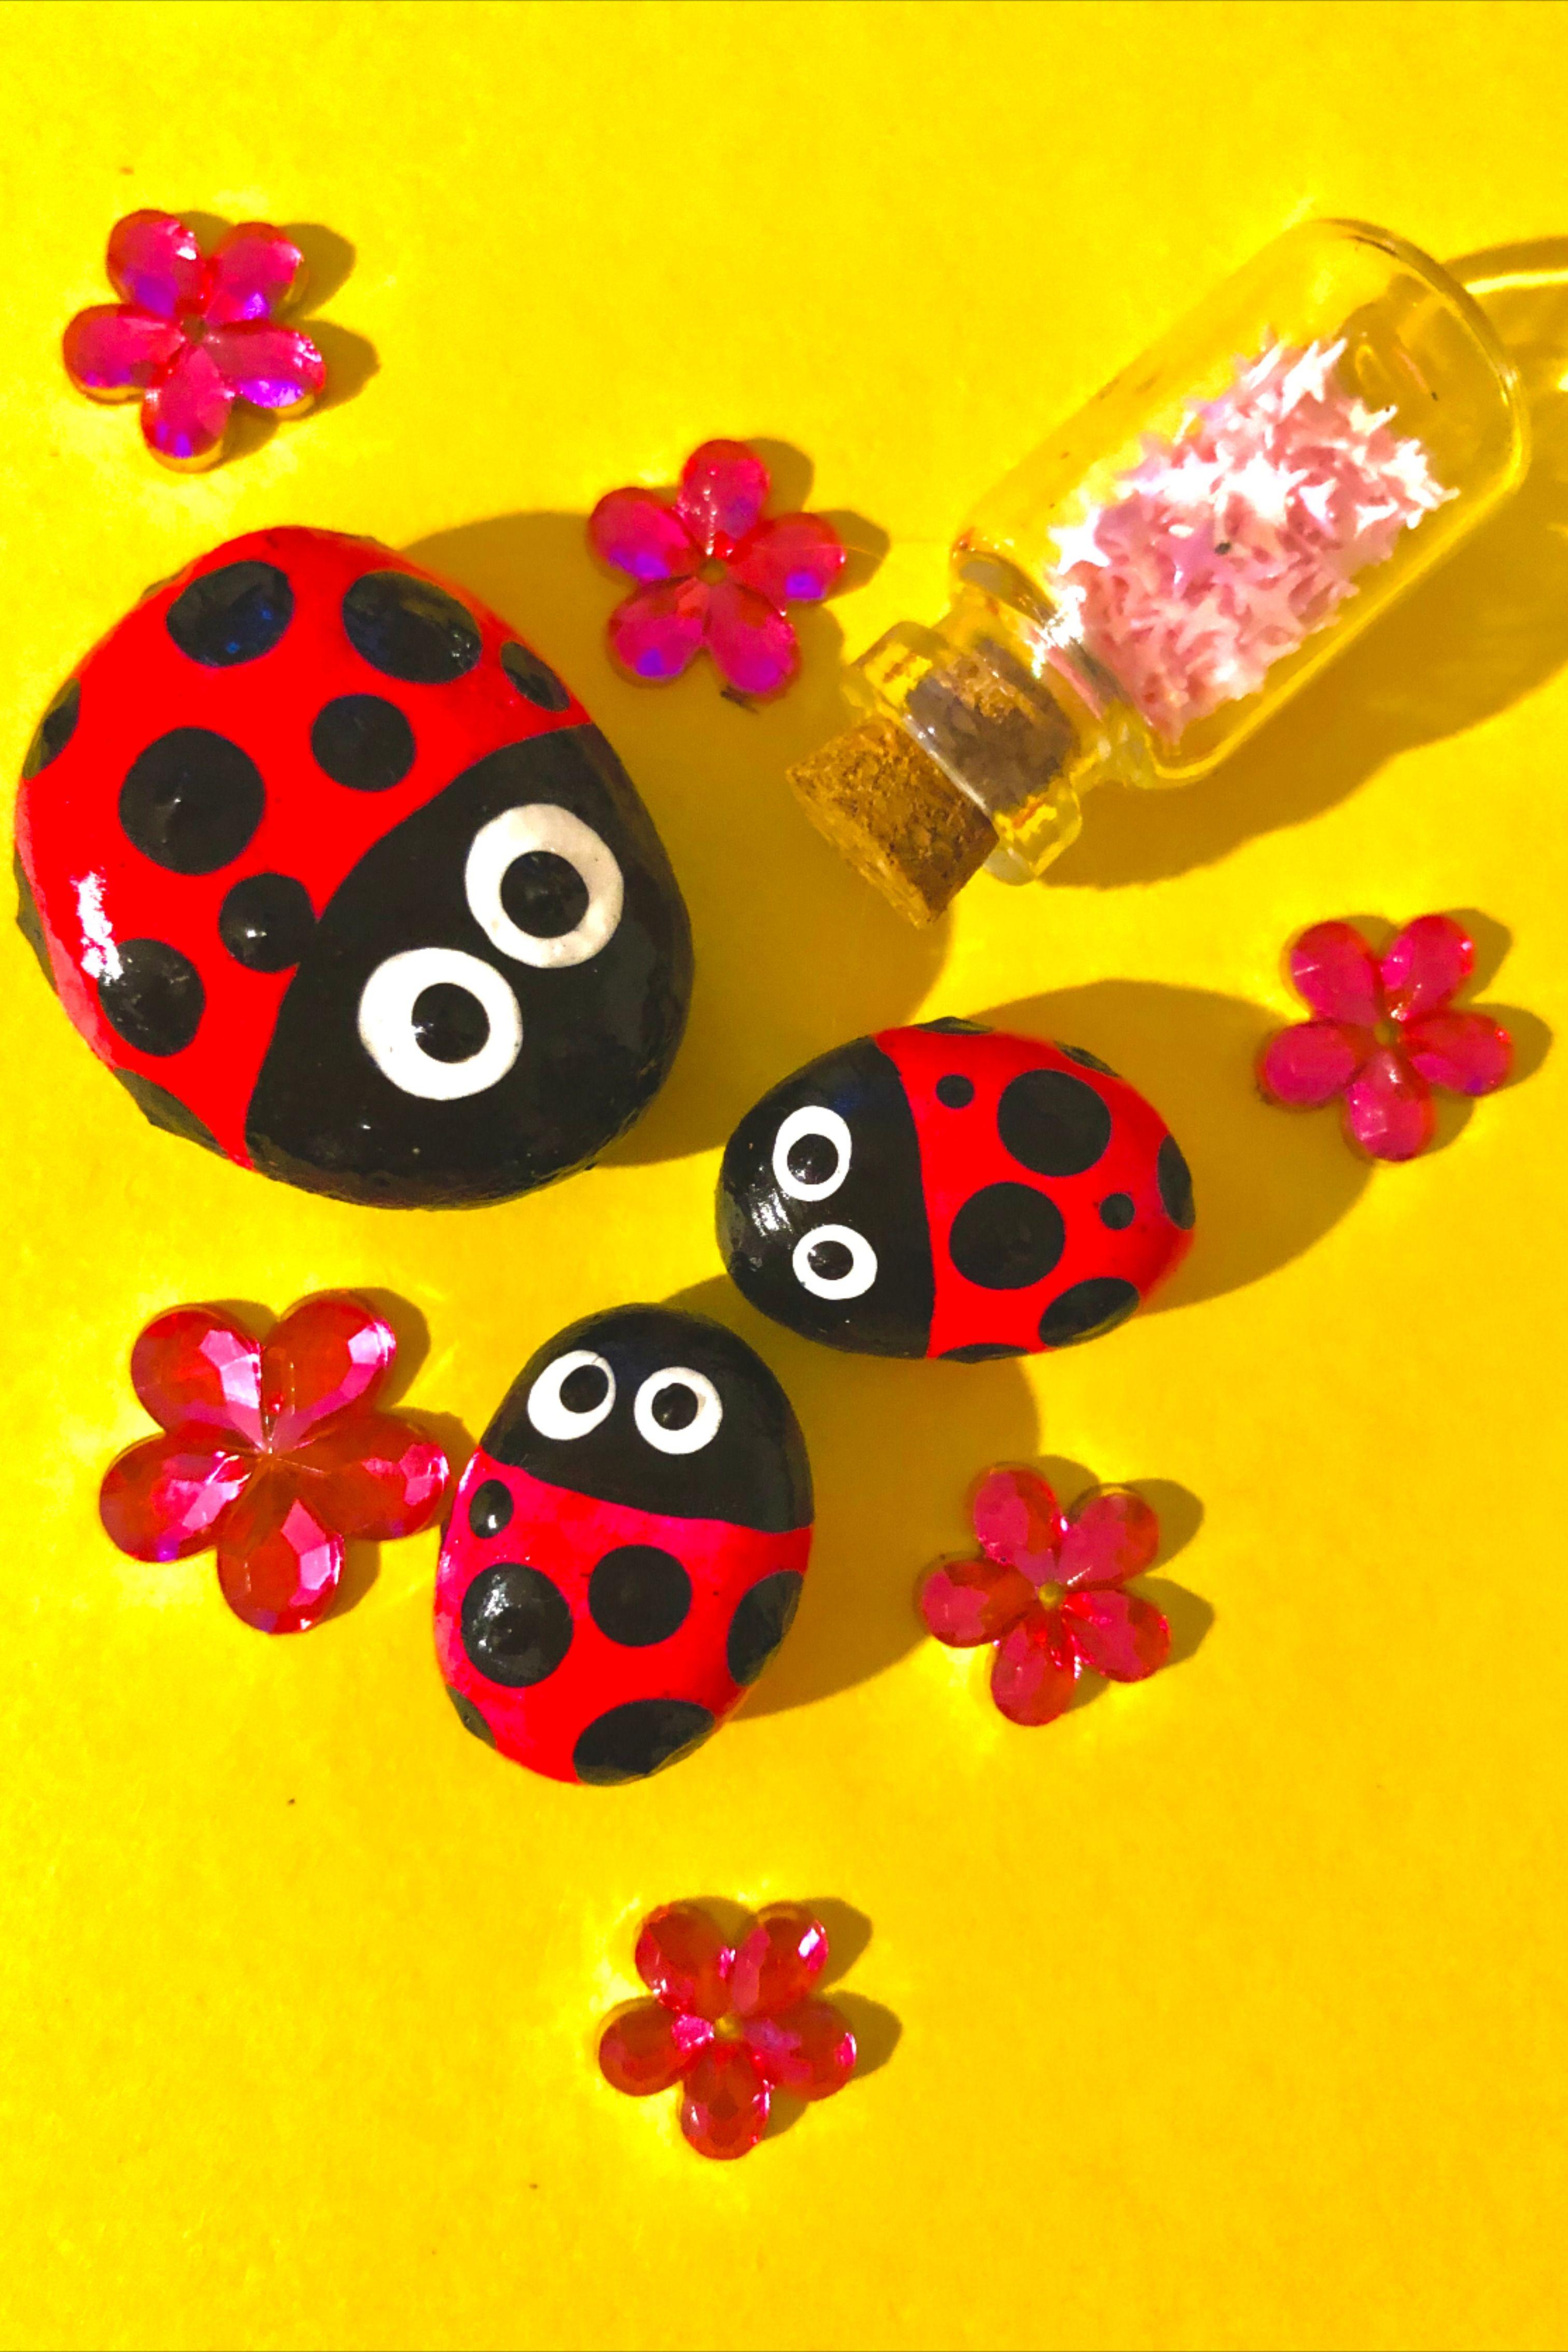 #ladybugs#stoneart#pebbles#pebbleart#dotting#uniquegift#gift#art#uniqueart#artphotography#bohodecoration#gardendecoration#artwork#handpaintedrocks#paintedrocksideas#art#diy#mandalalovers#artlovers